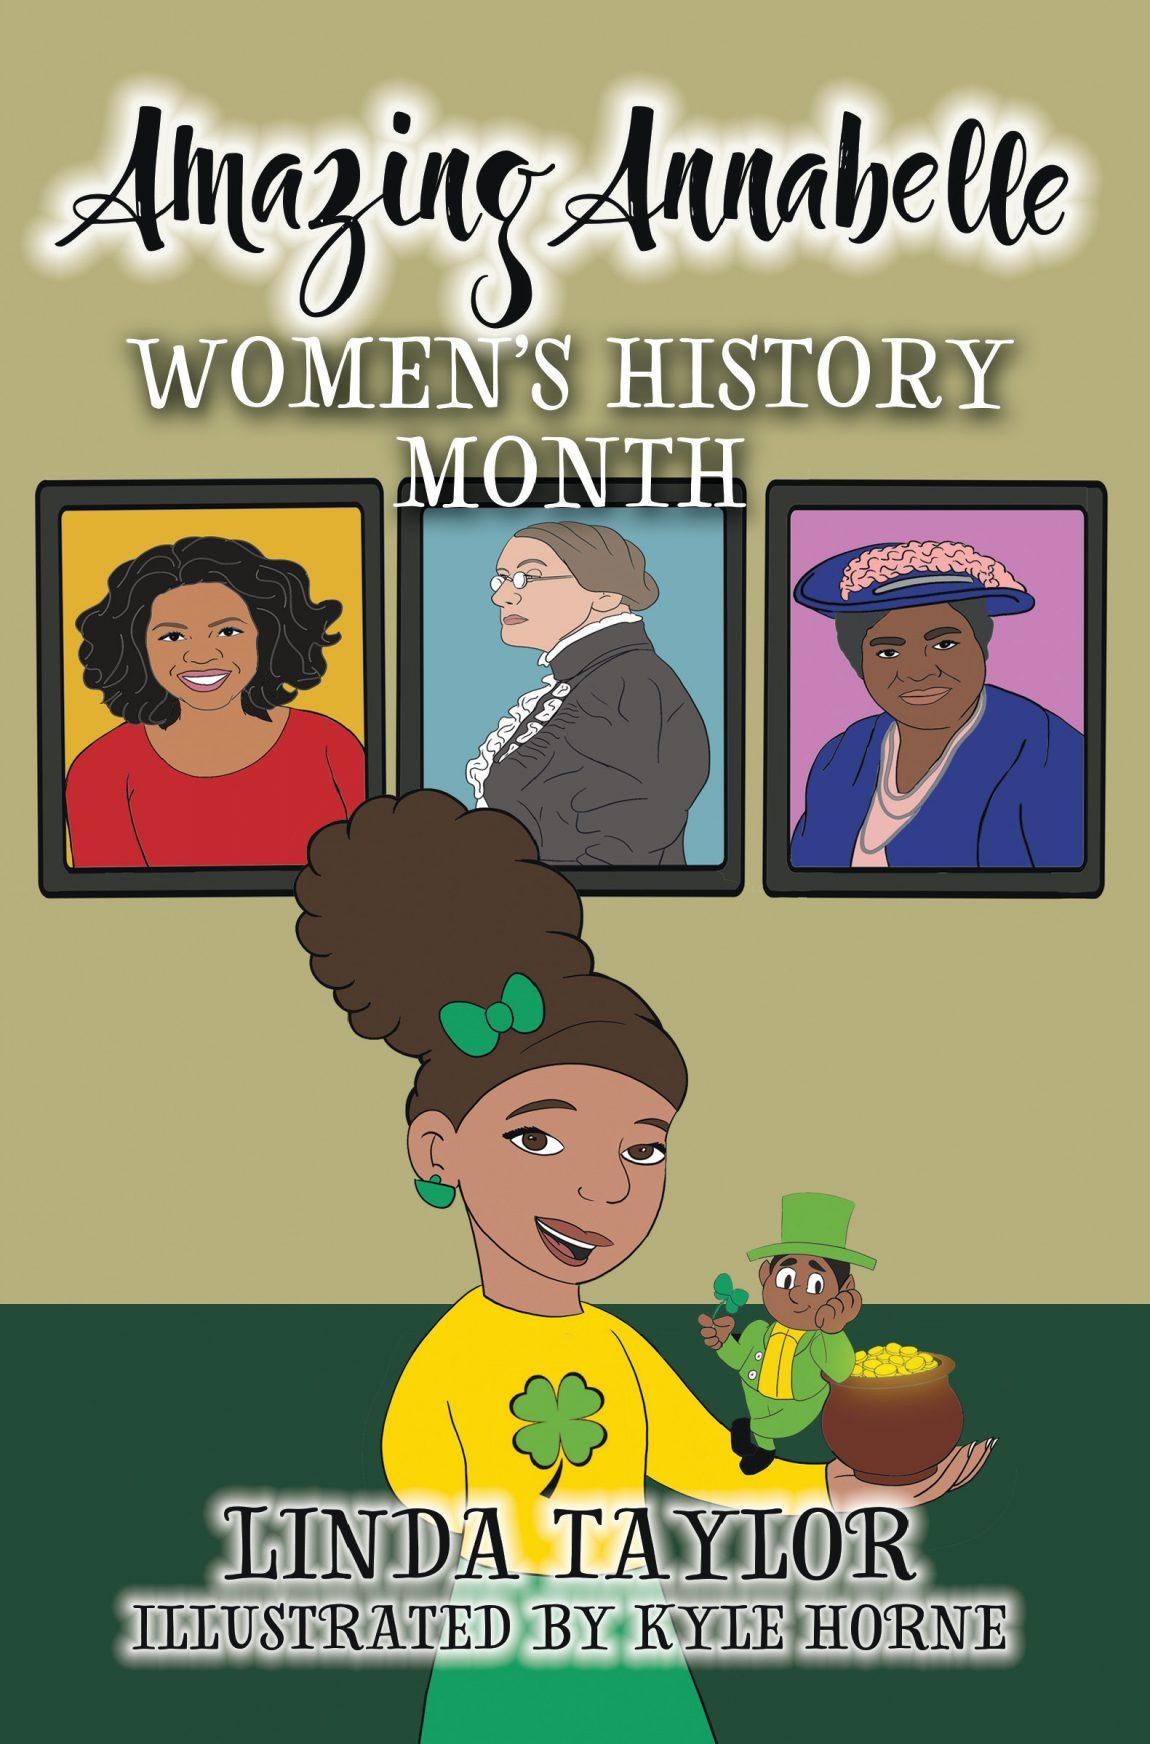 Women's-History-Month.jpg